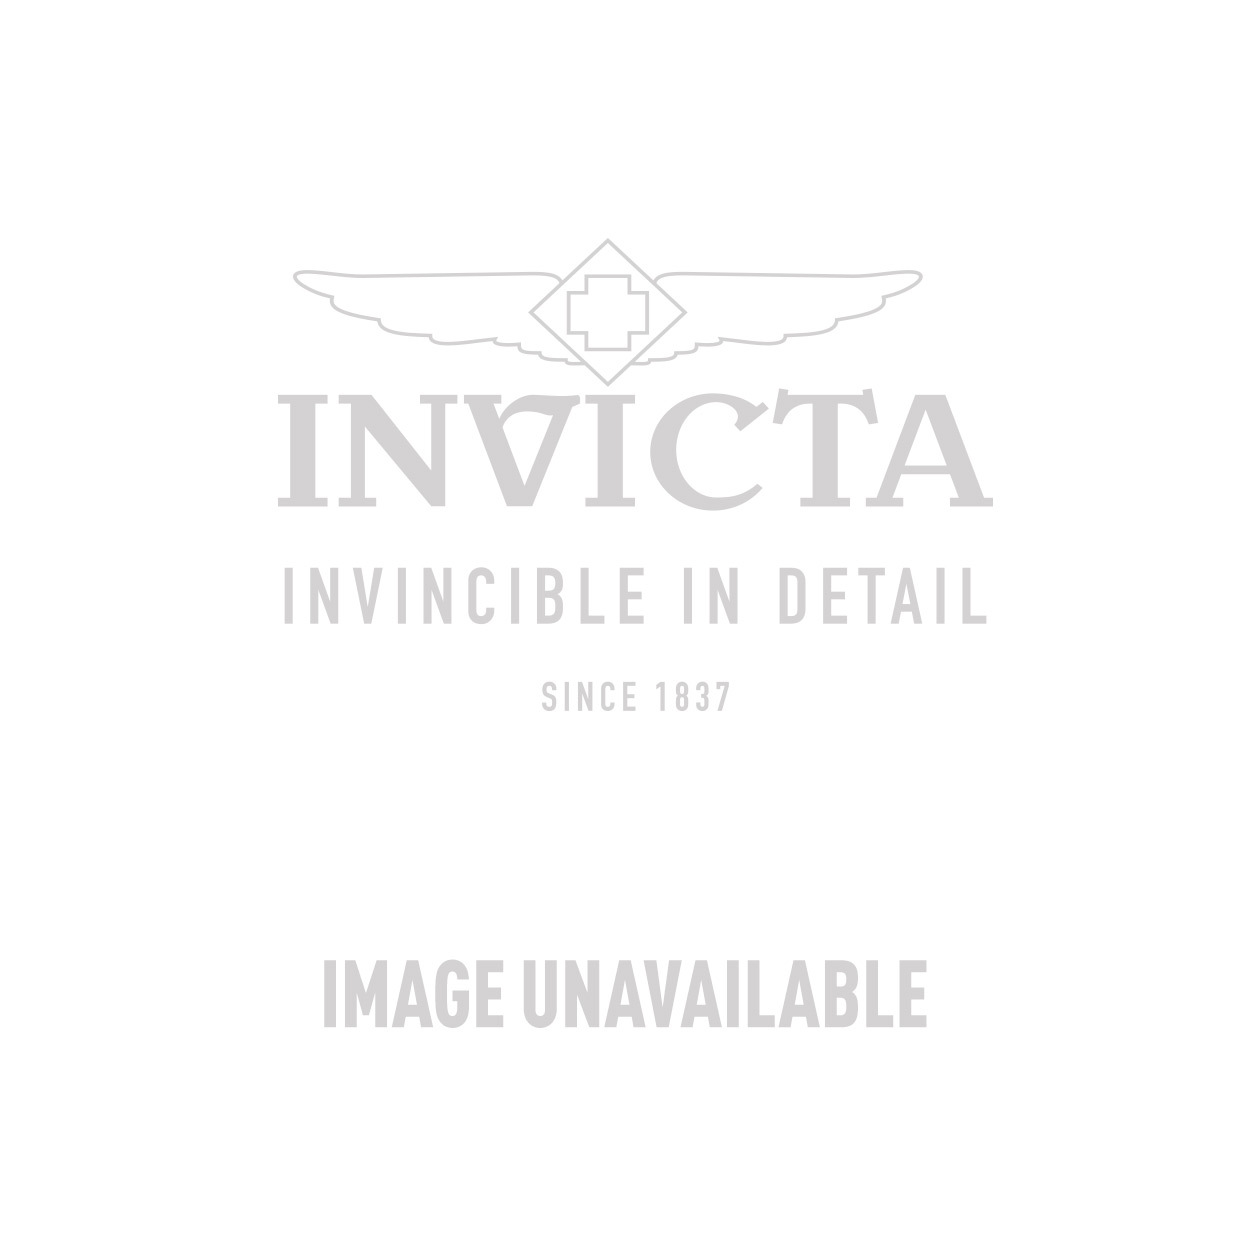 Invicta Bolt Thunderbolt Quartz Watch - Black, Stainless Steel case  Stainless Steel band - Model 21358